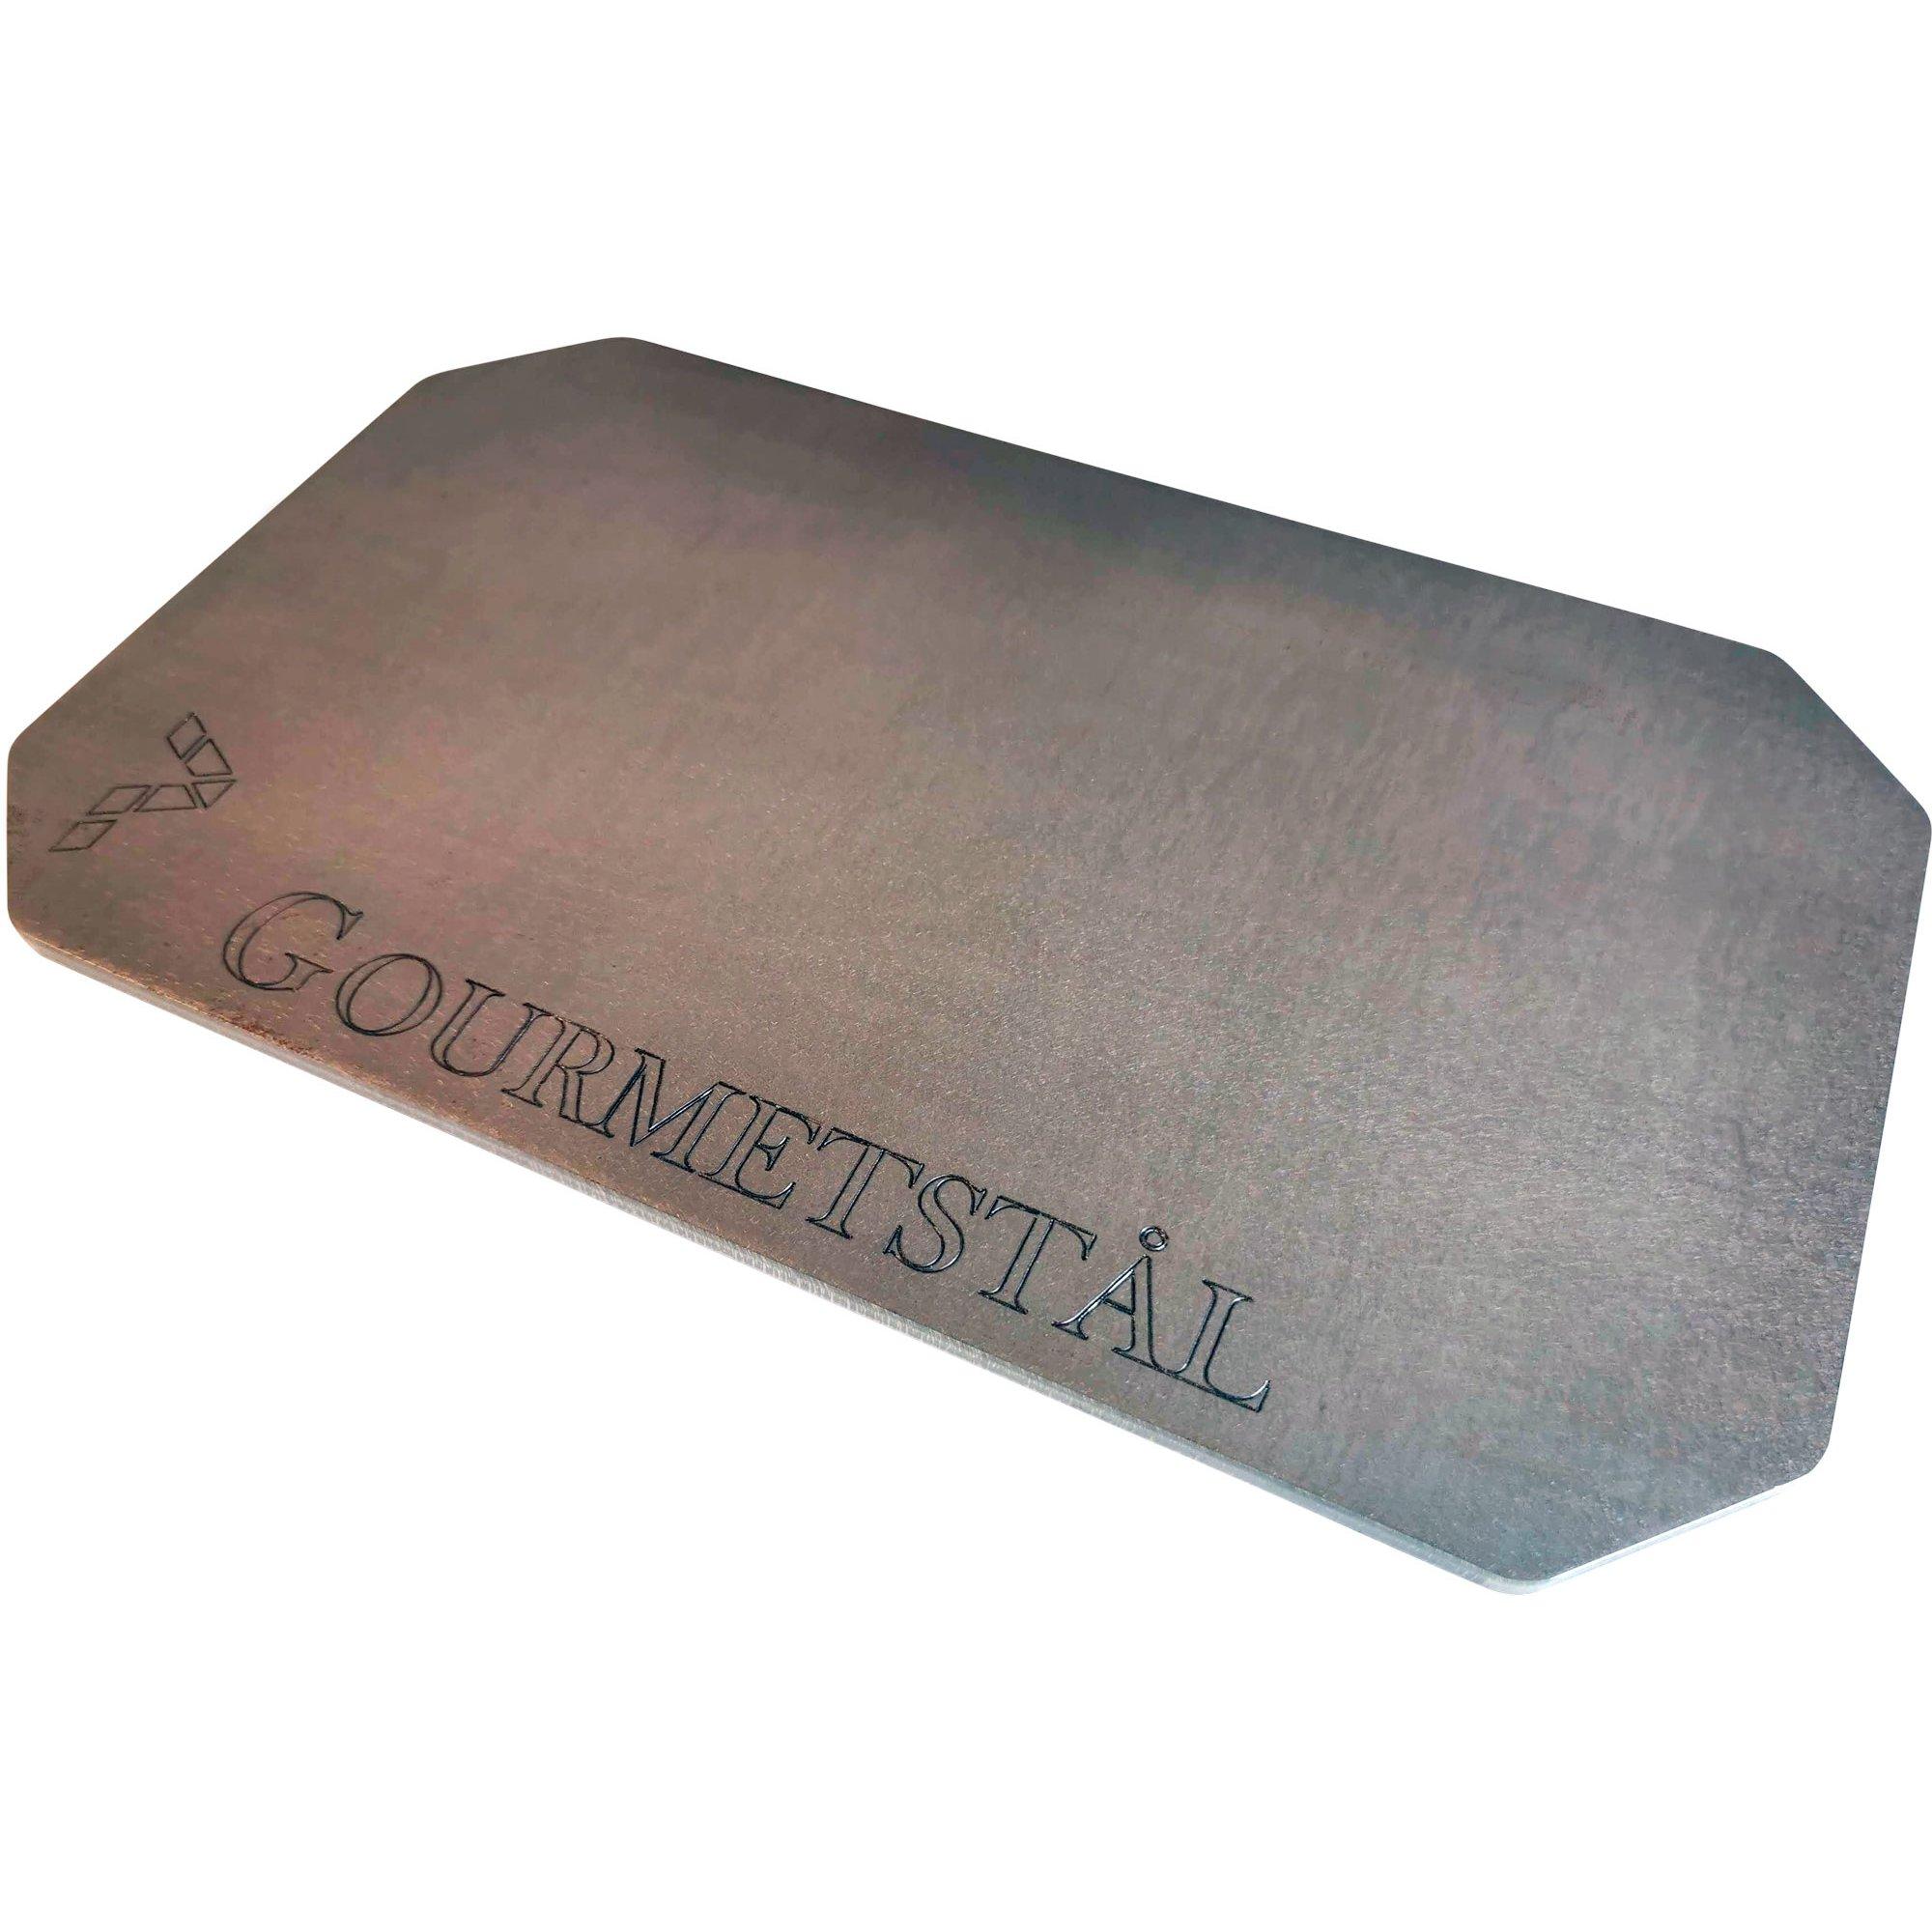 Gourmetstål Stekbord Smash 30×18 cm